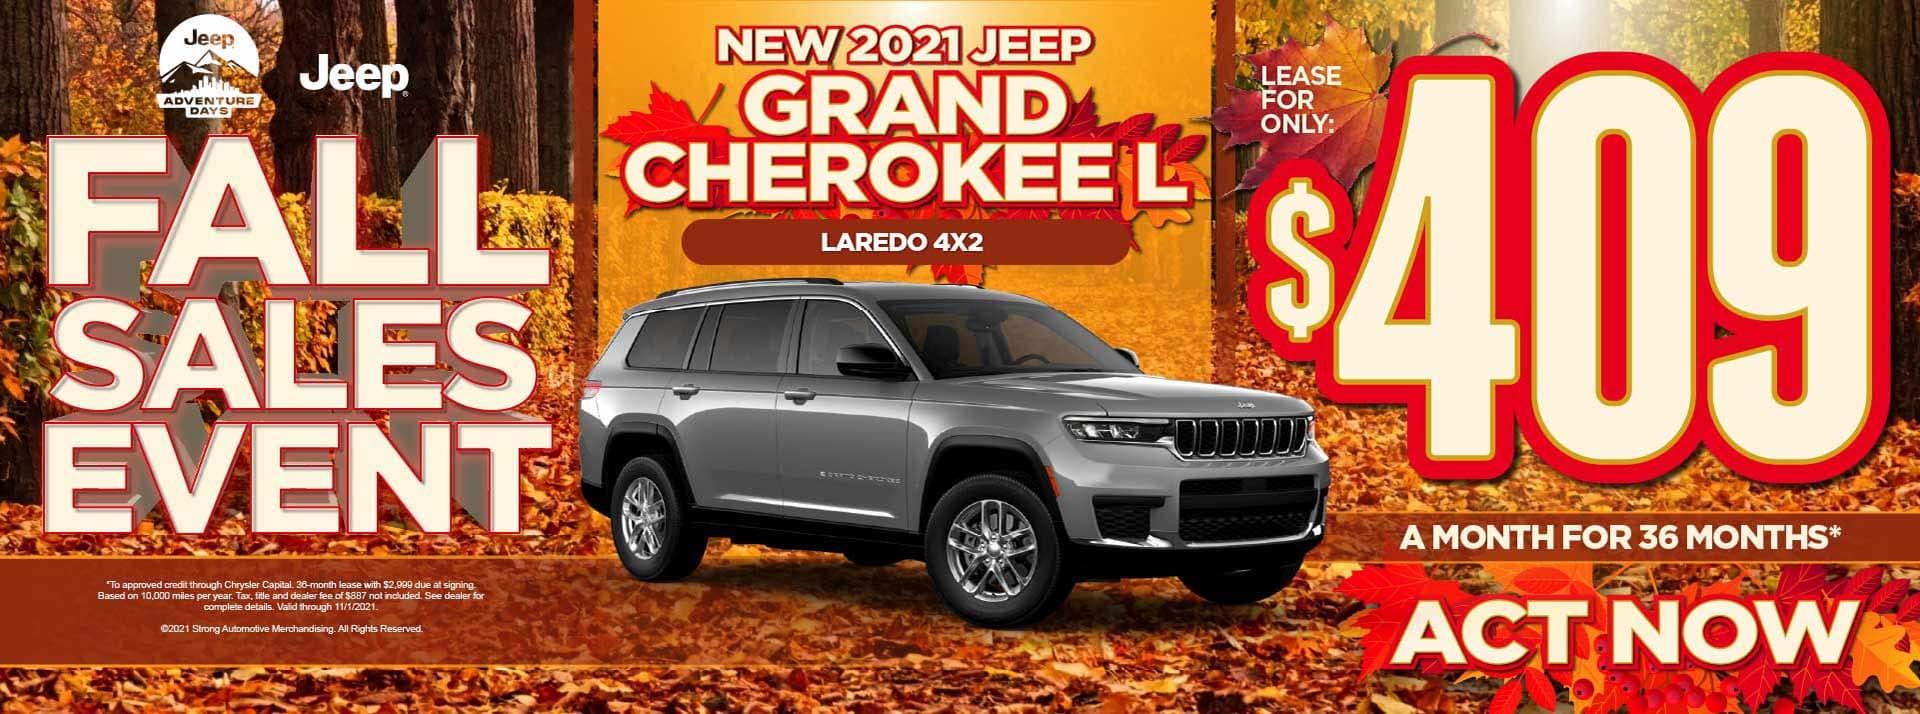 New 2021 Jeep Grand Cherokee L Loredo 4x2 - $409 / mo ACT NOW